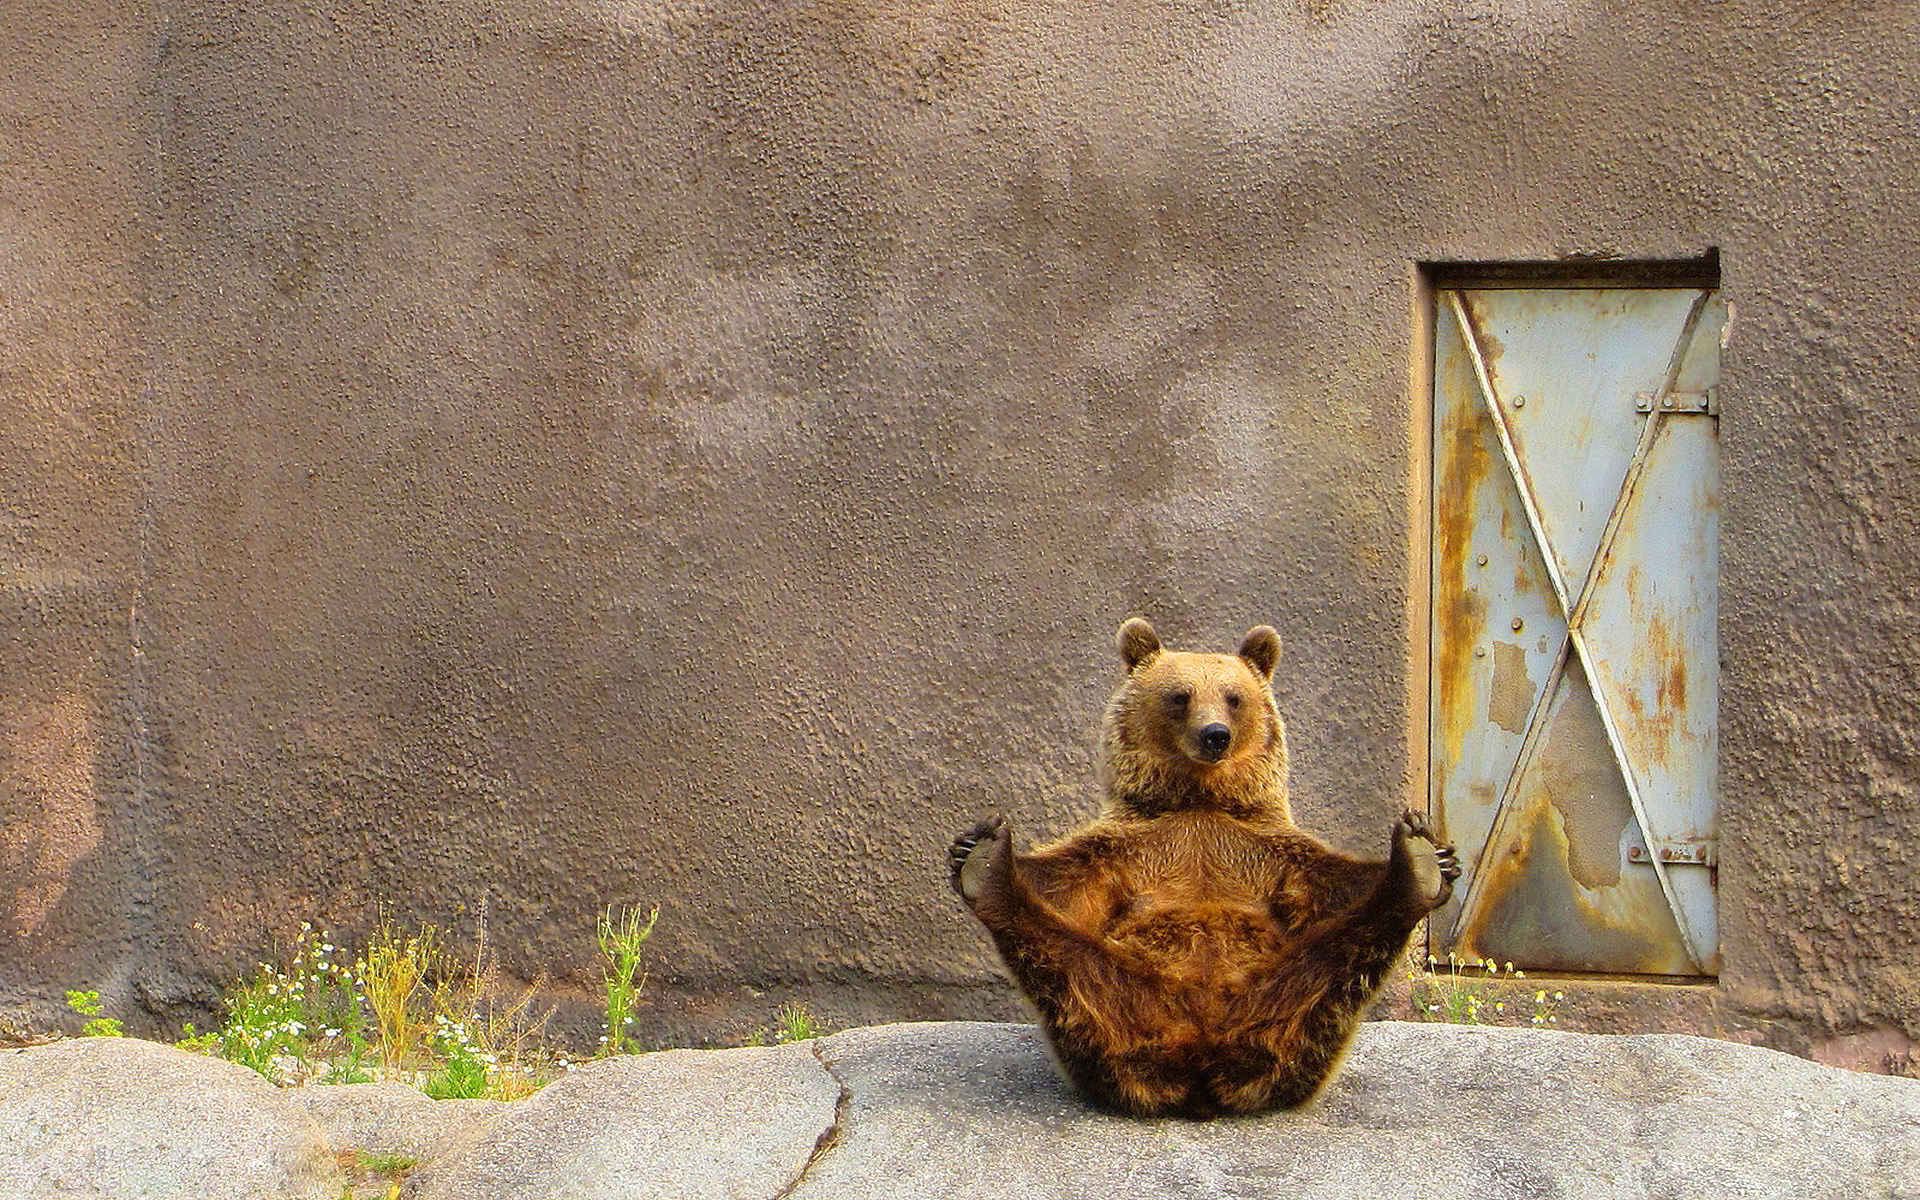 Funny bear pose